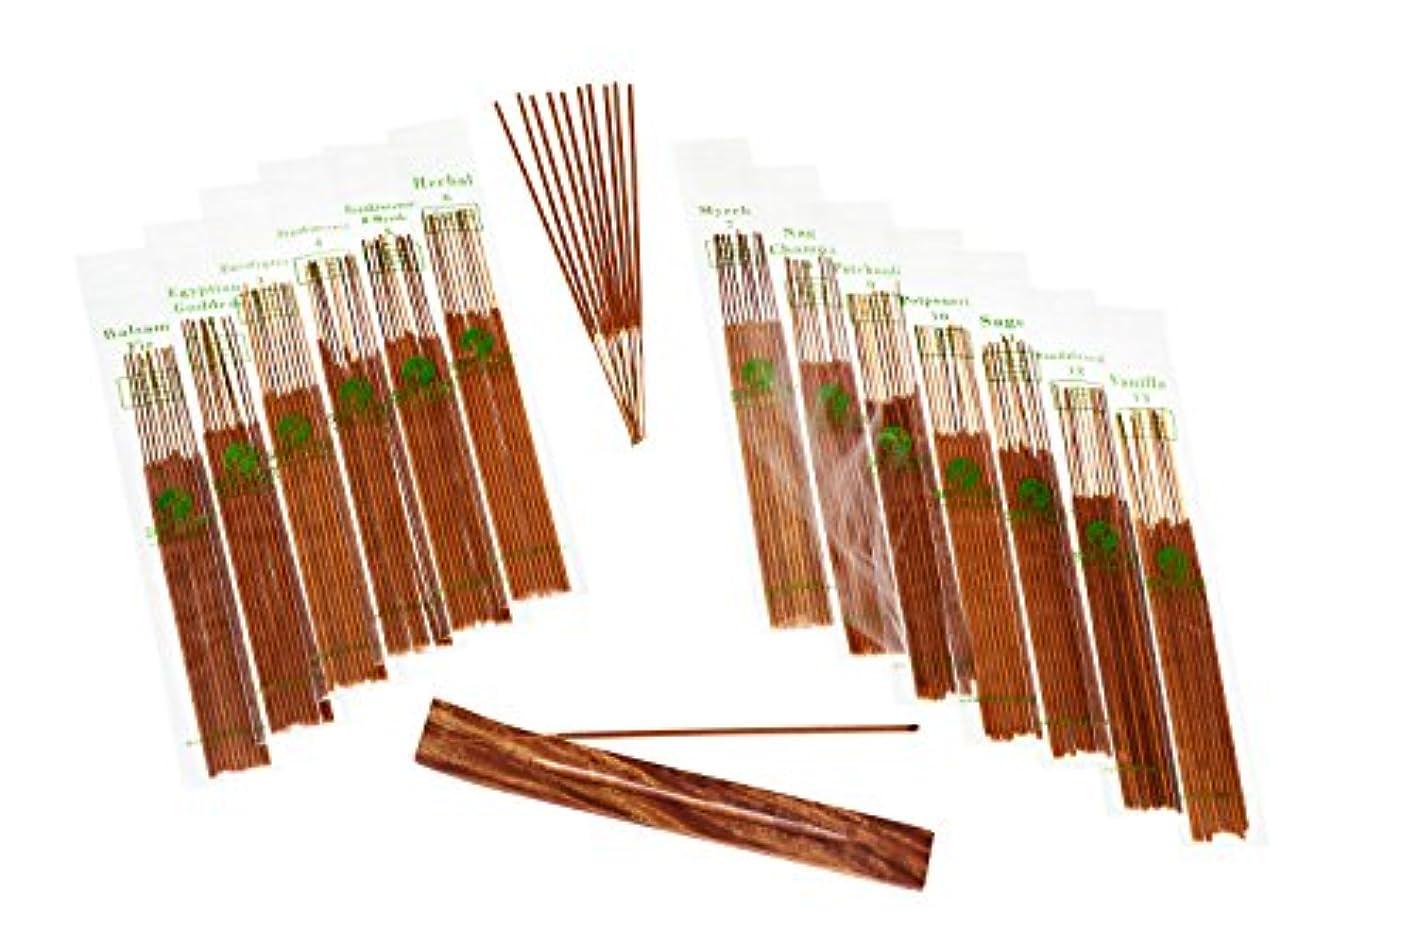 SENSARI HAND-DIPPED INCENSE & BURNER GIFT SET - 120 Stick Variety, 12 Scent Assortment - Nag Champa, Sandalwood...